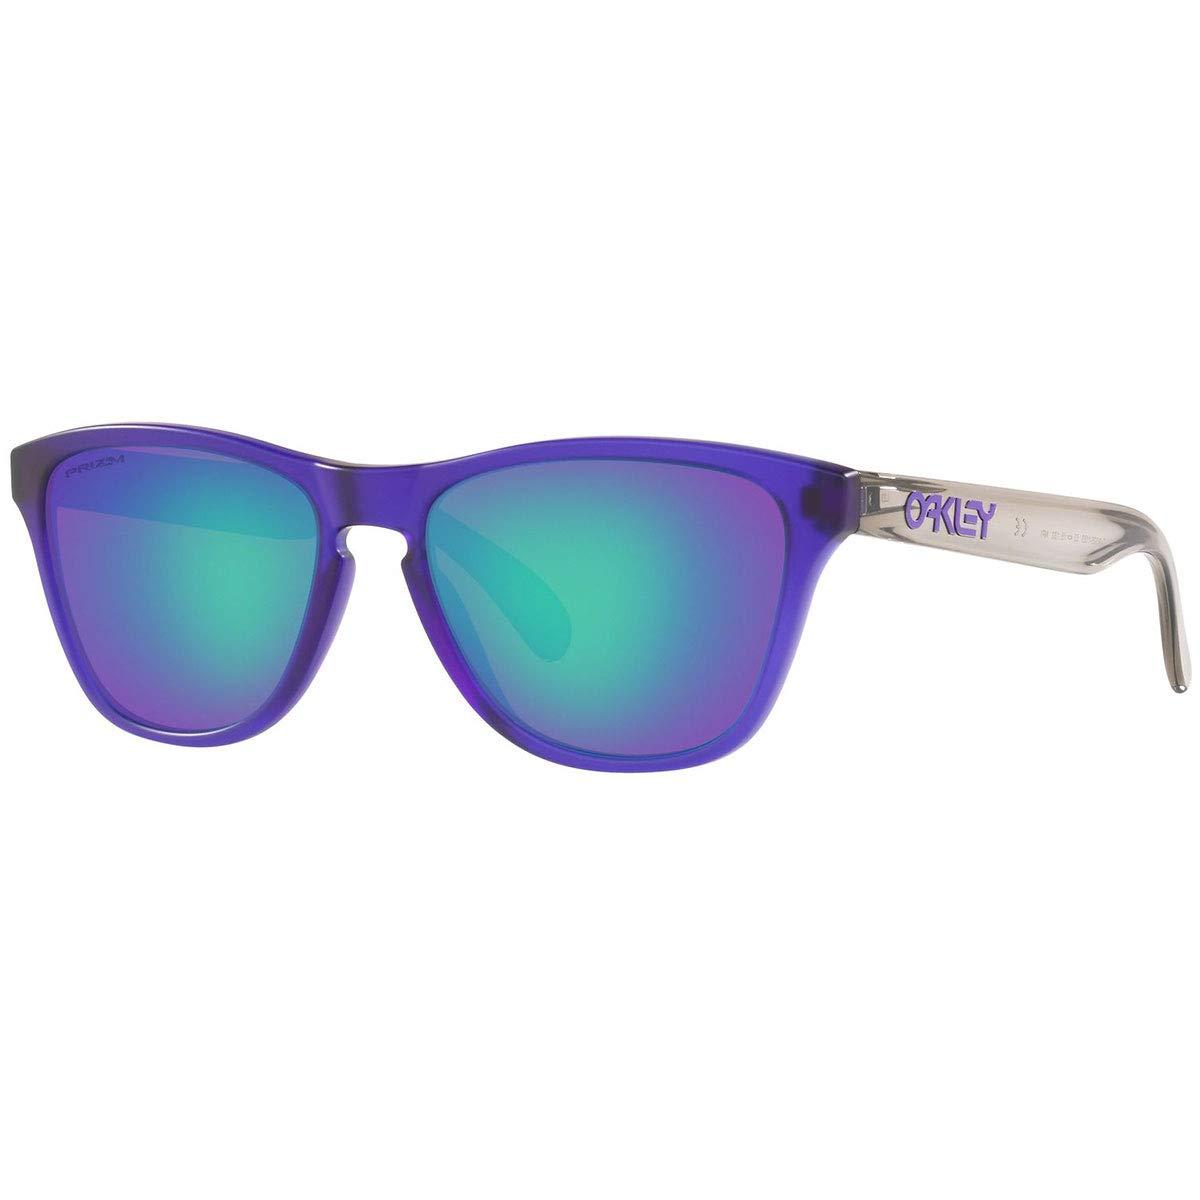 Oakley Boys OJ9006 Frogskins XS Round Sunglasses, Matte Translucent Purple/Prizm Sapphire, 53 mm by Oakley